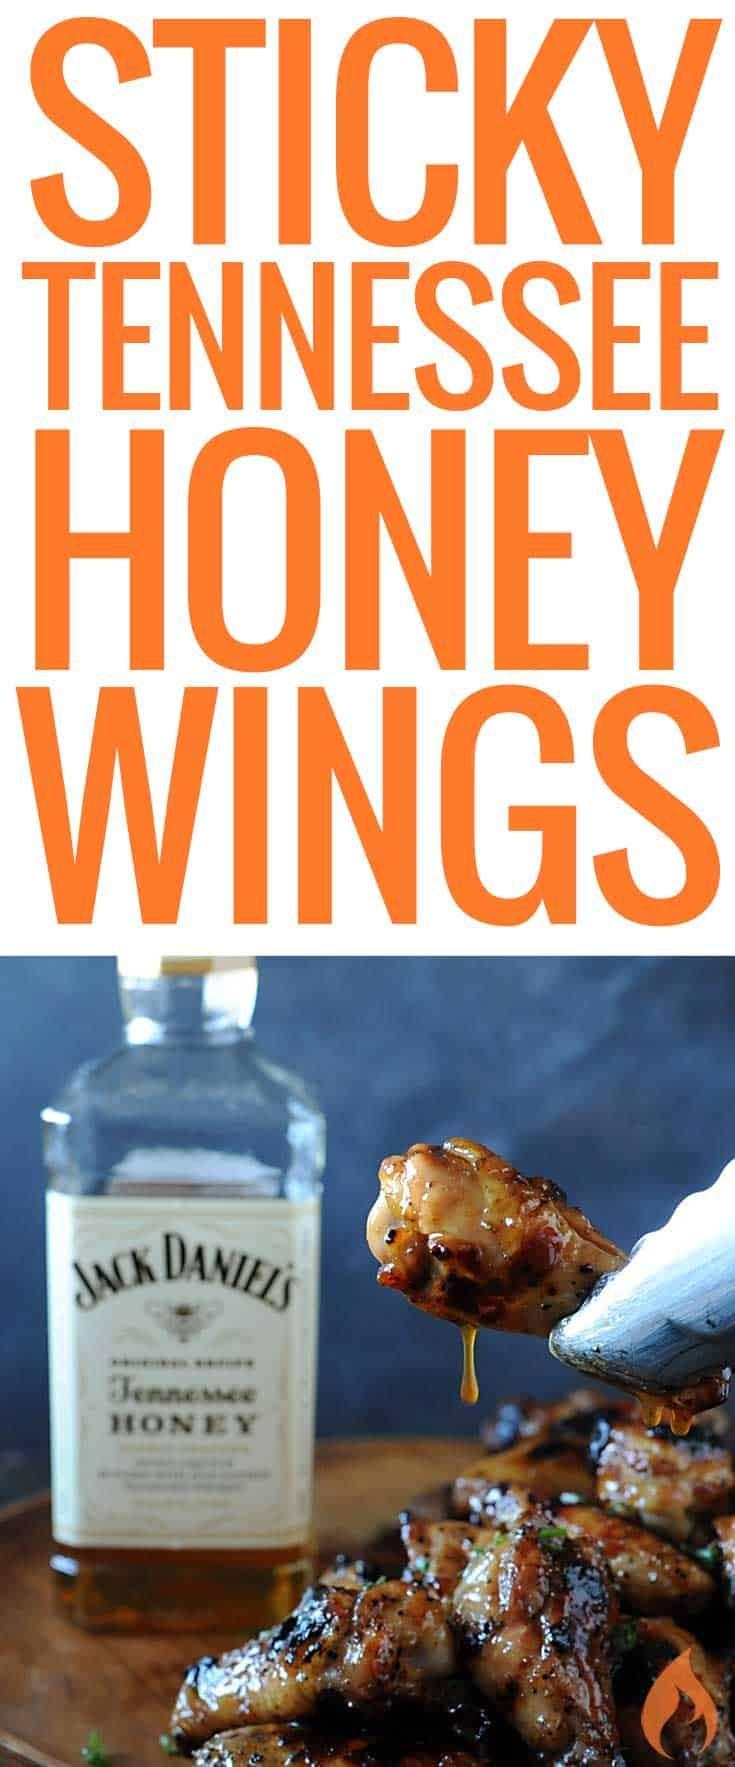 sticky tennessee honey wings recipe honey wings tennessee honey honey bbq sauce sticky tennessee honey wings recipe